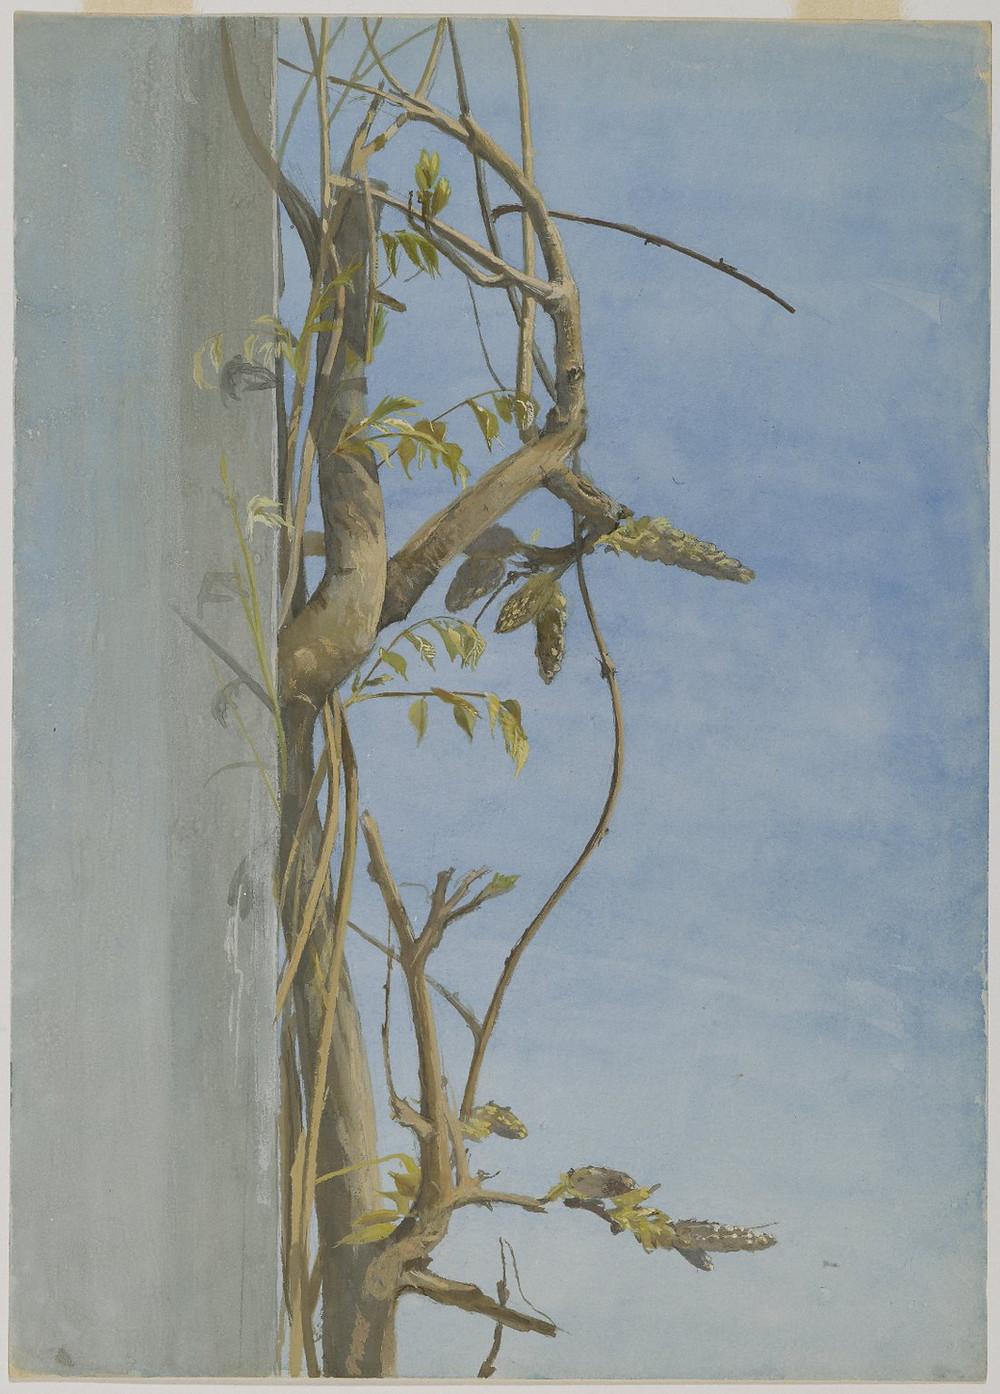 Wisteria on a Wall (1870s) by Fidelia Bridges (1834 - 1923)